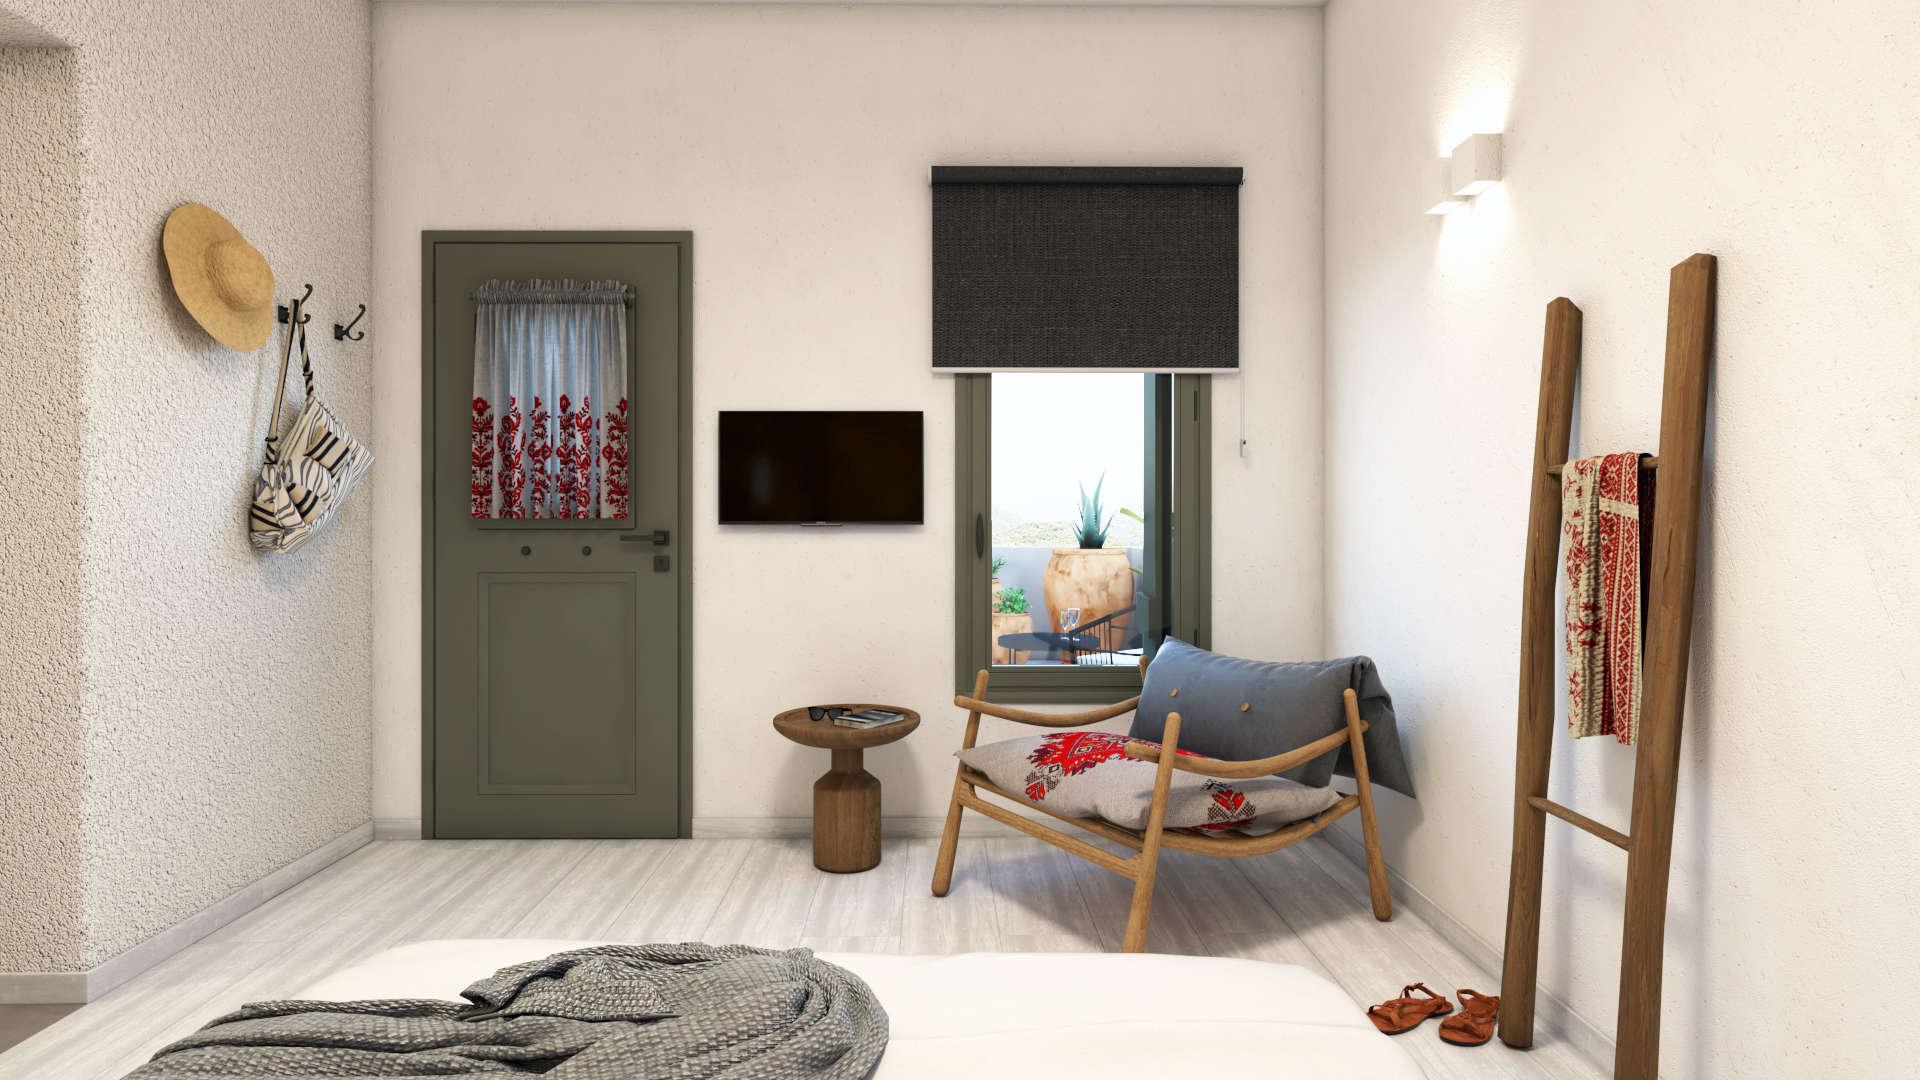 Hotel in a village,suite, interior design, bedroom. Τουριστικό κατάλυμα σε οικισμό, σουίτα, κραβατοκάμαρα.